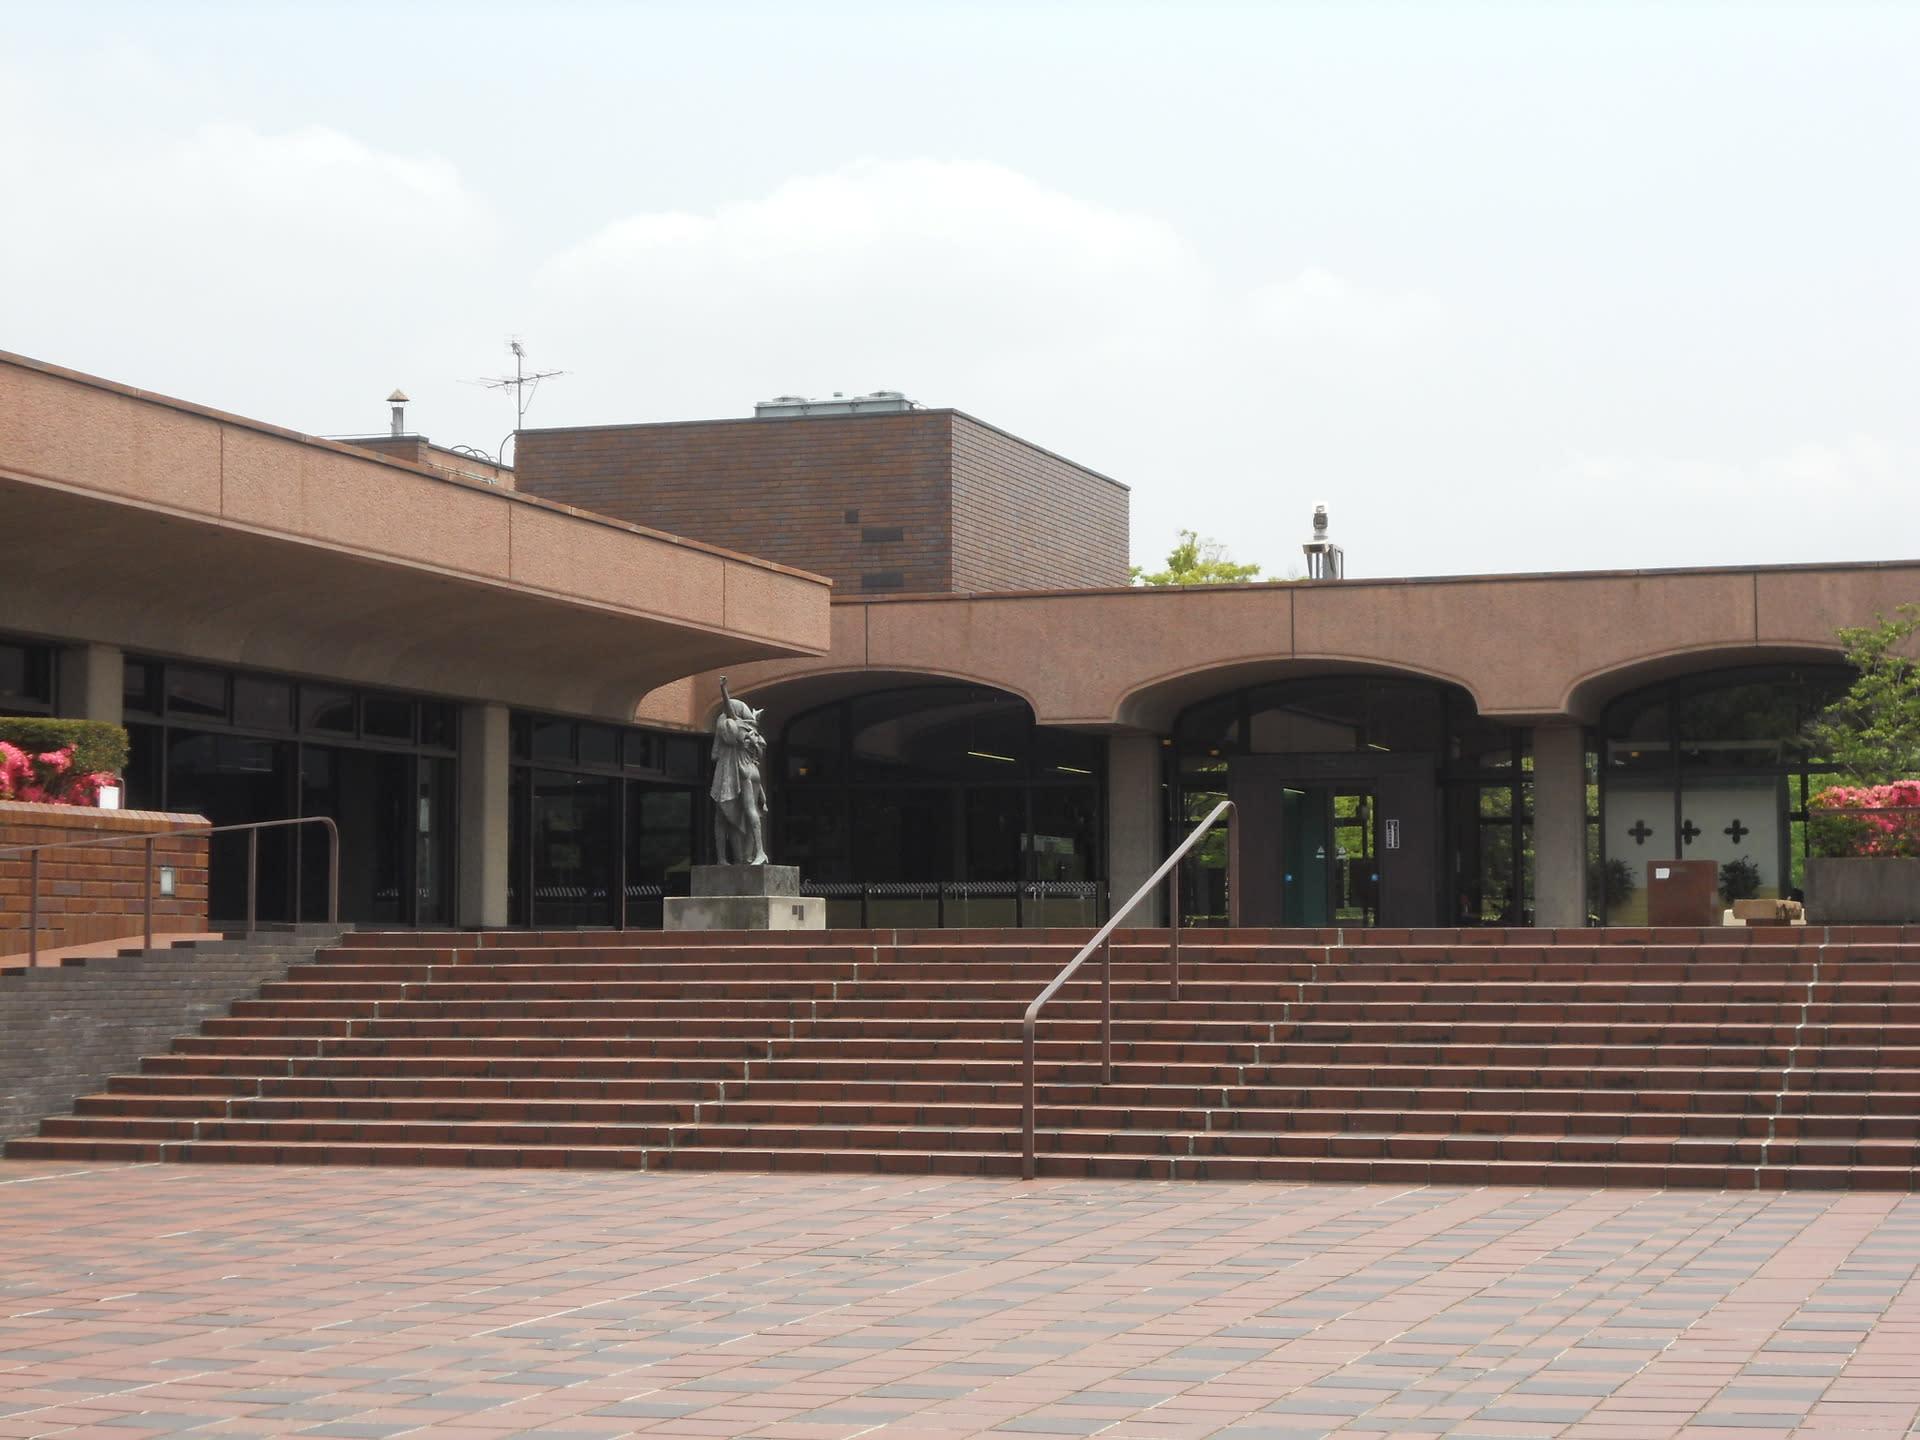 福岡市美術館 - Fukuoka Art Museum - JapaneseClass.jp